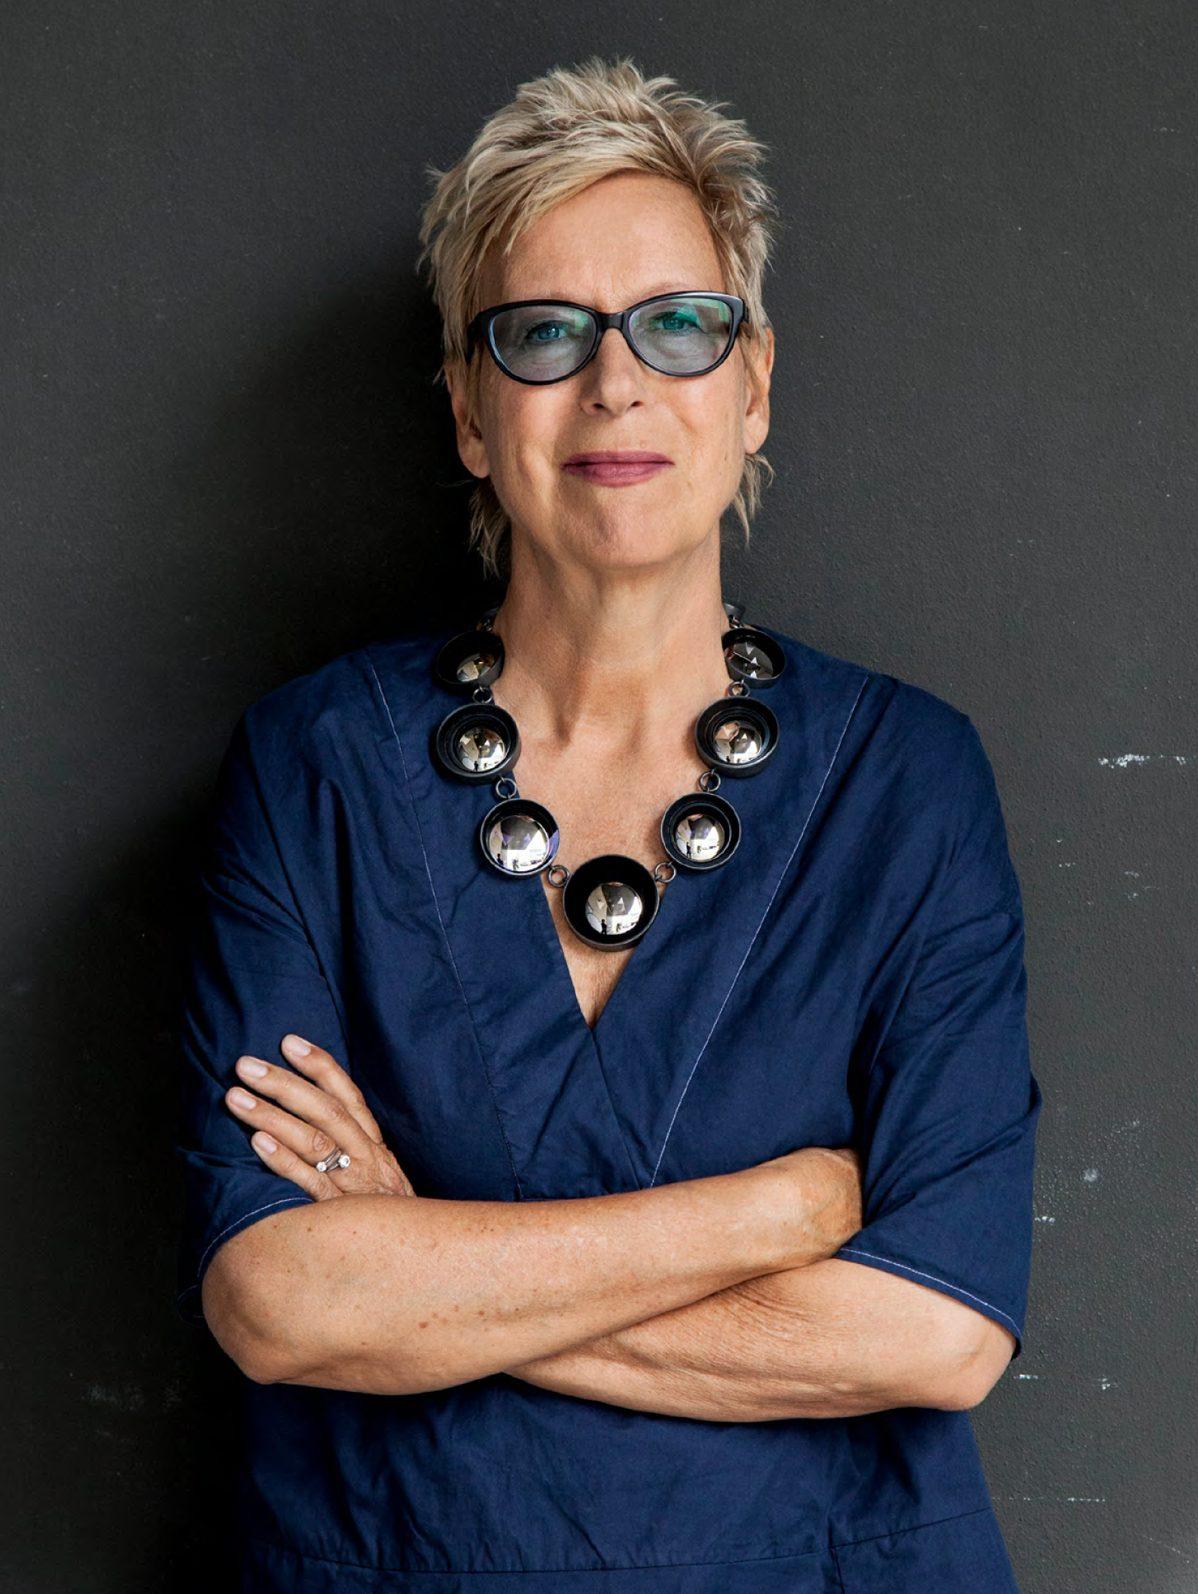 Doris Dörrie draagt Jiro Kamata, Spiegel, halssieraad, 2013, portret